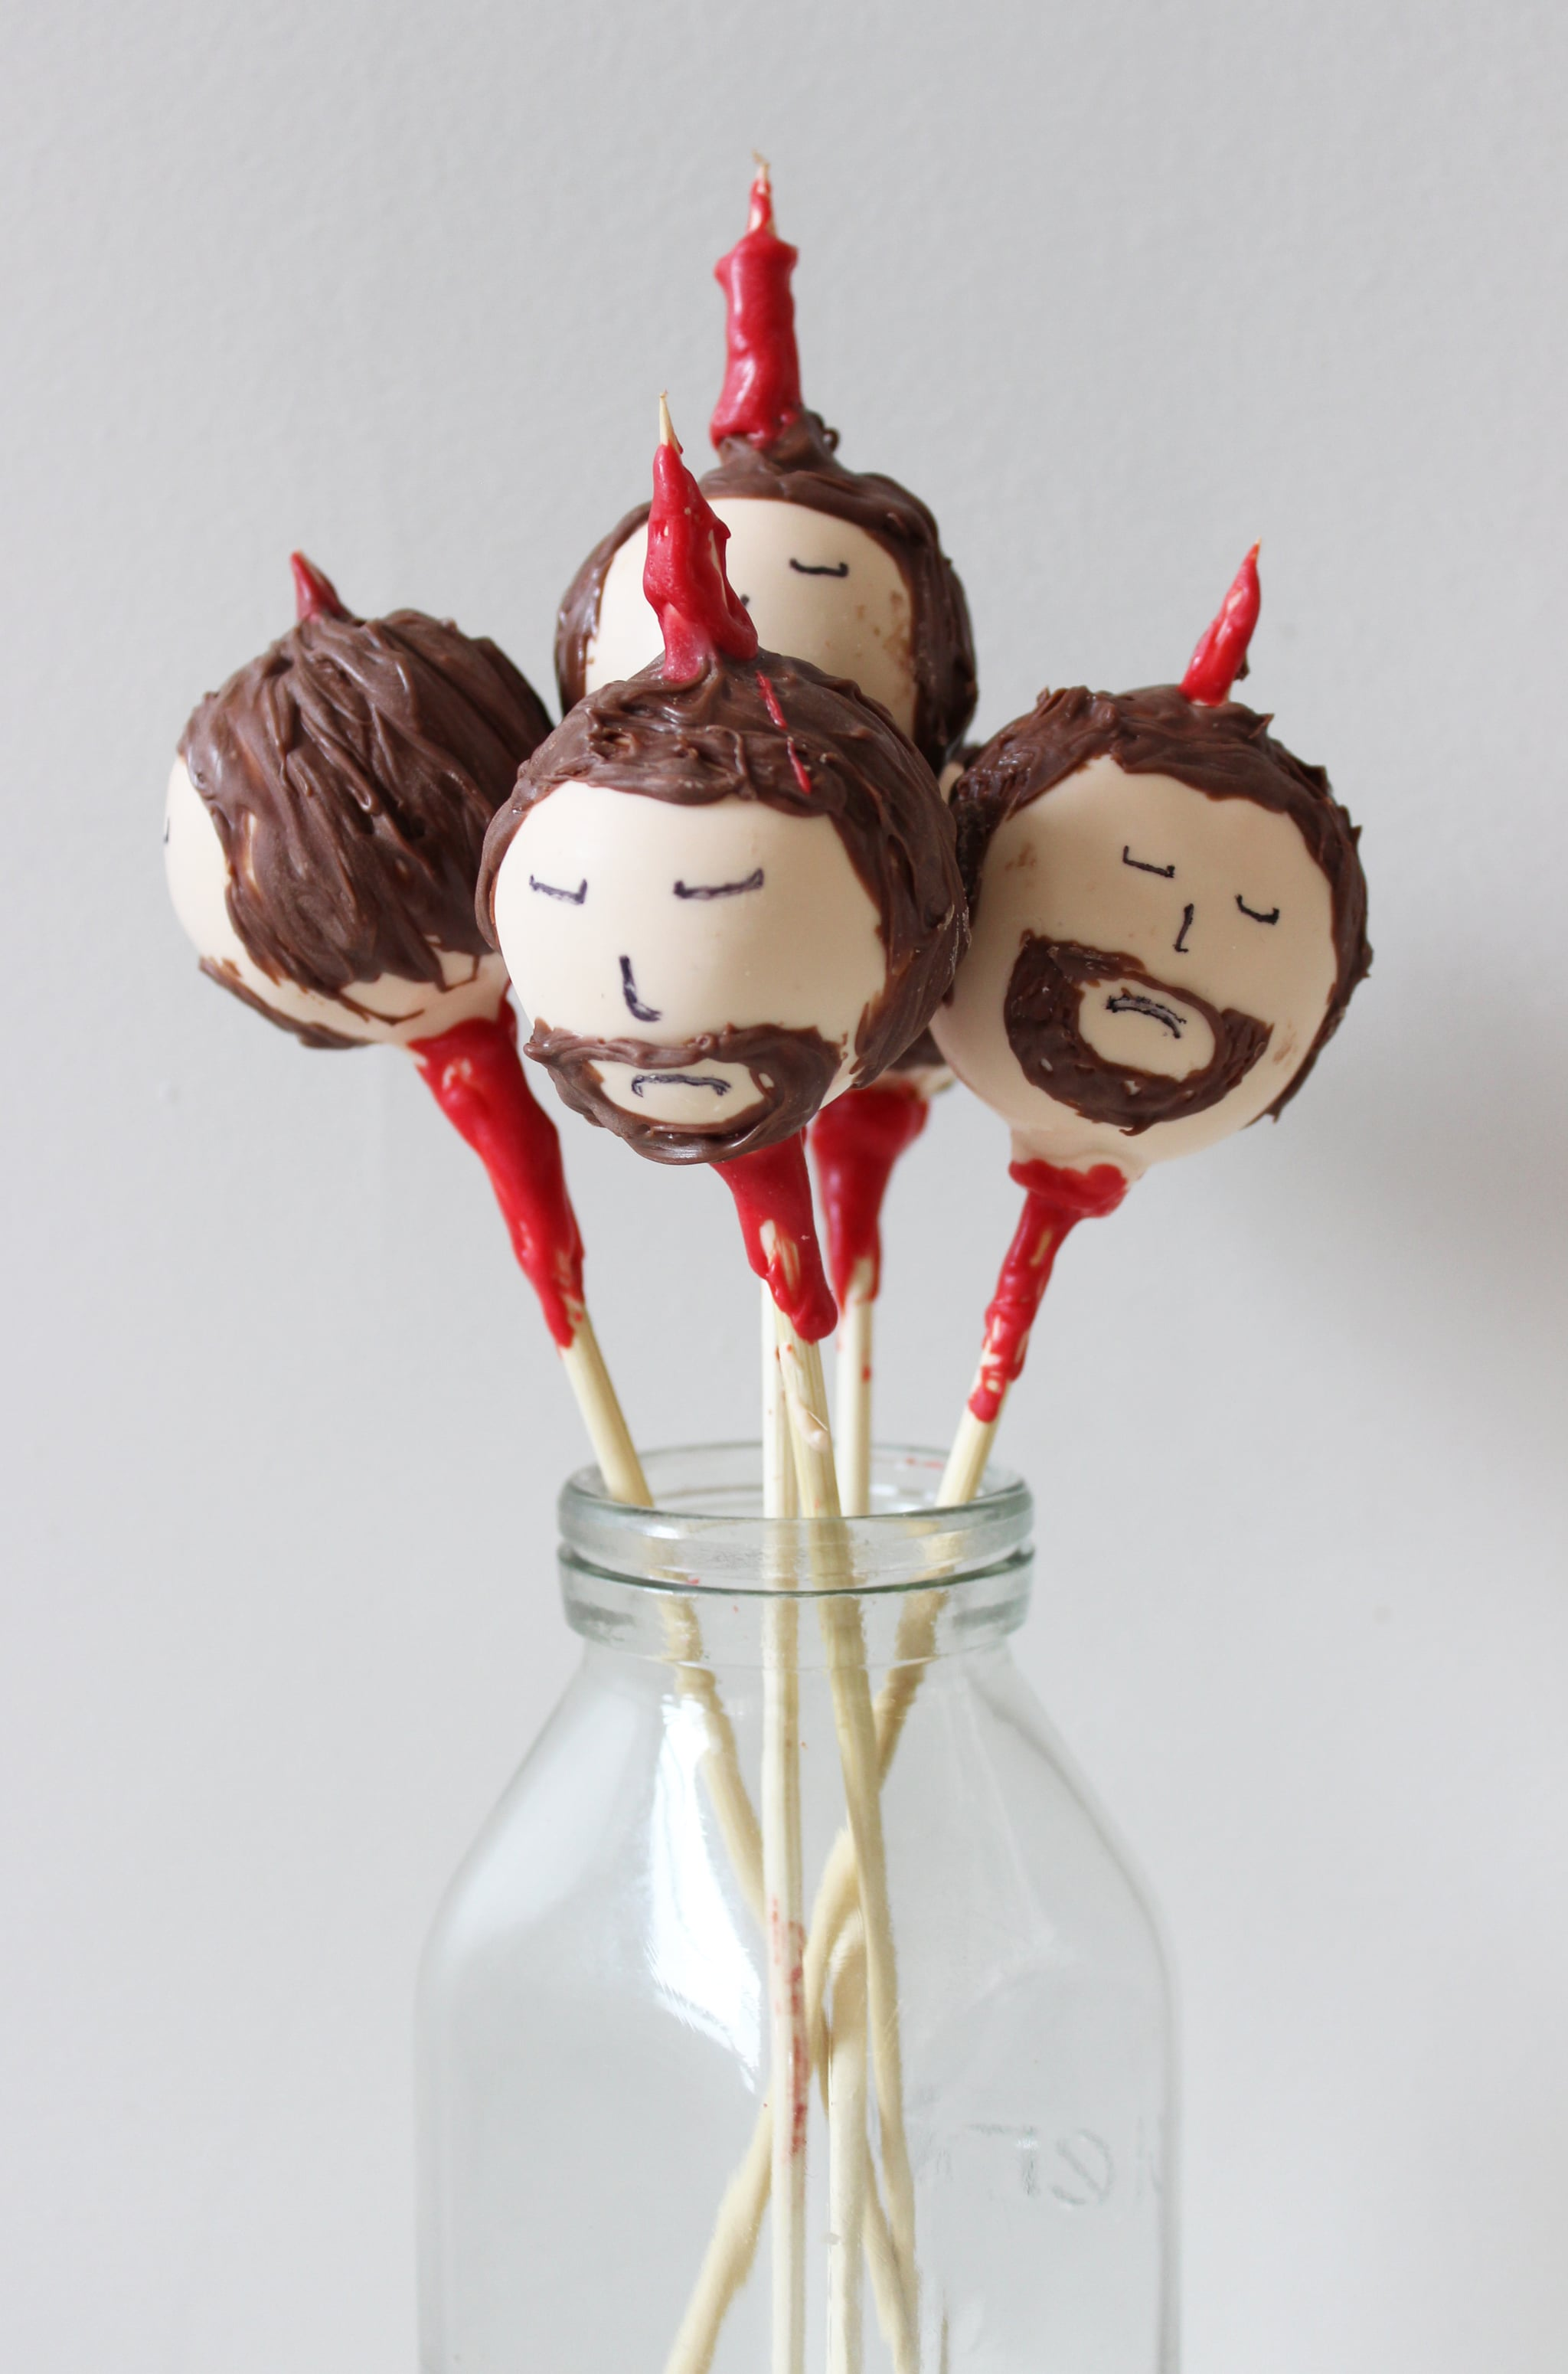 Game Of Thrones Ned Stark Cake Pops Recipe Popsugar Food